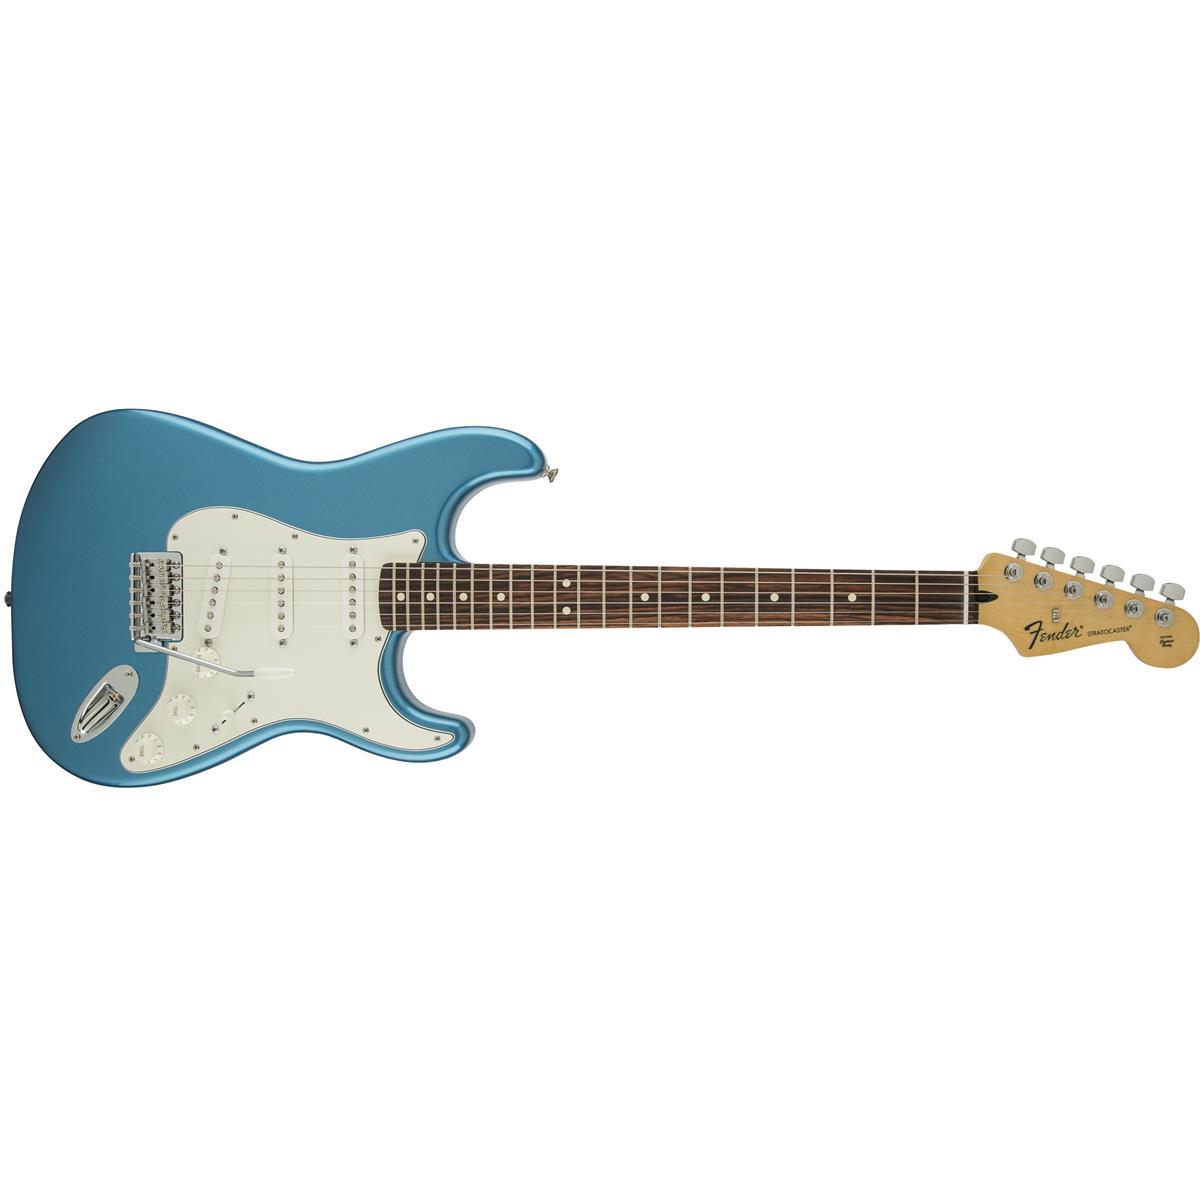 FENDER STRATOCASTER STANDARD MEX LAKE PLACID BLUE RW - 0144600502